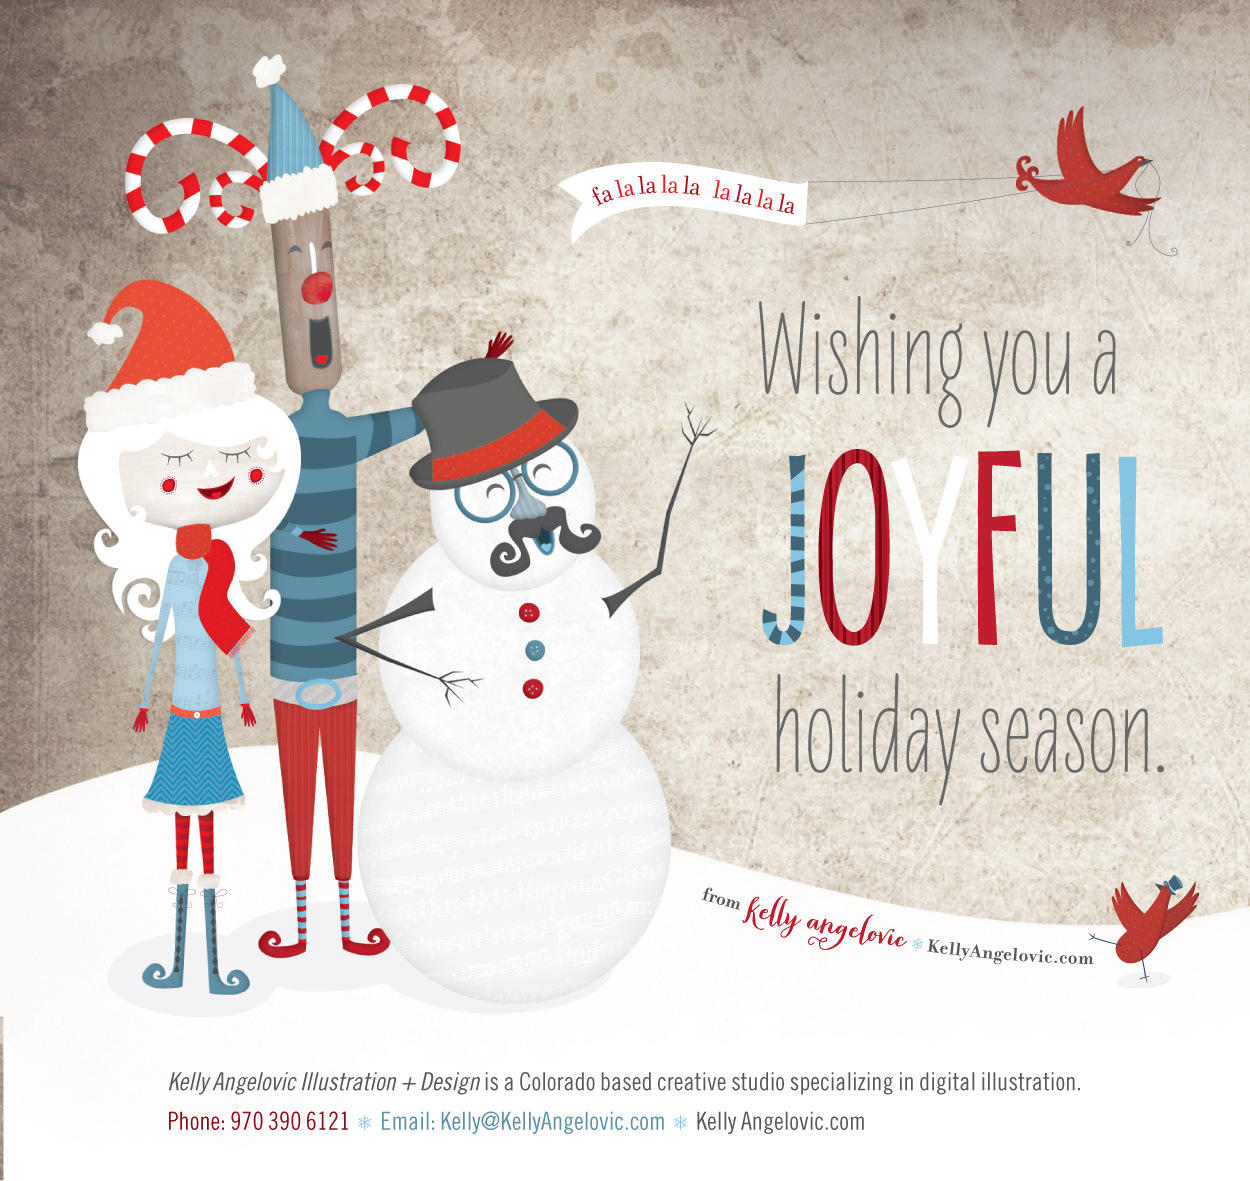 Holiday Illustration for Kelly Angelovic Illustration + Design